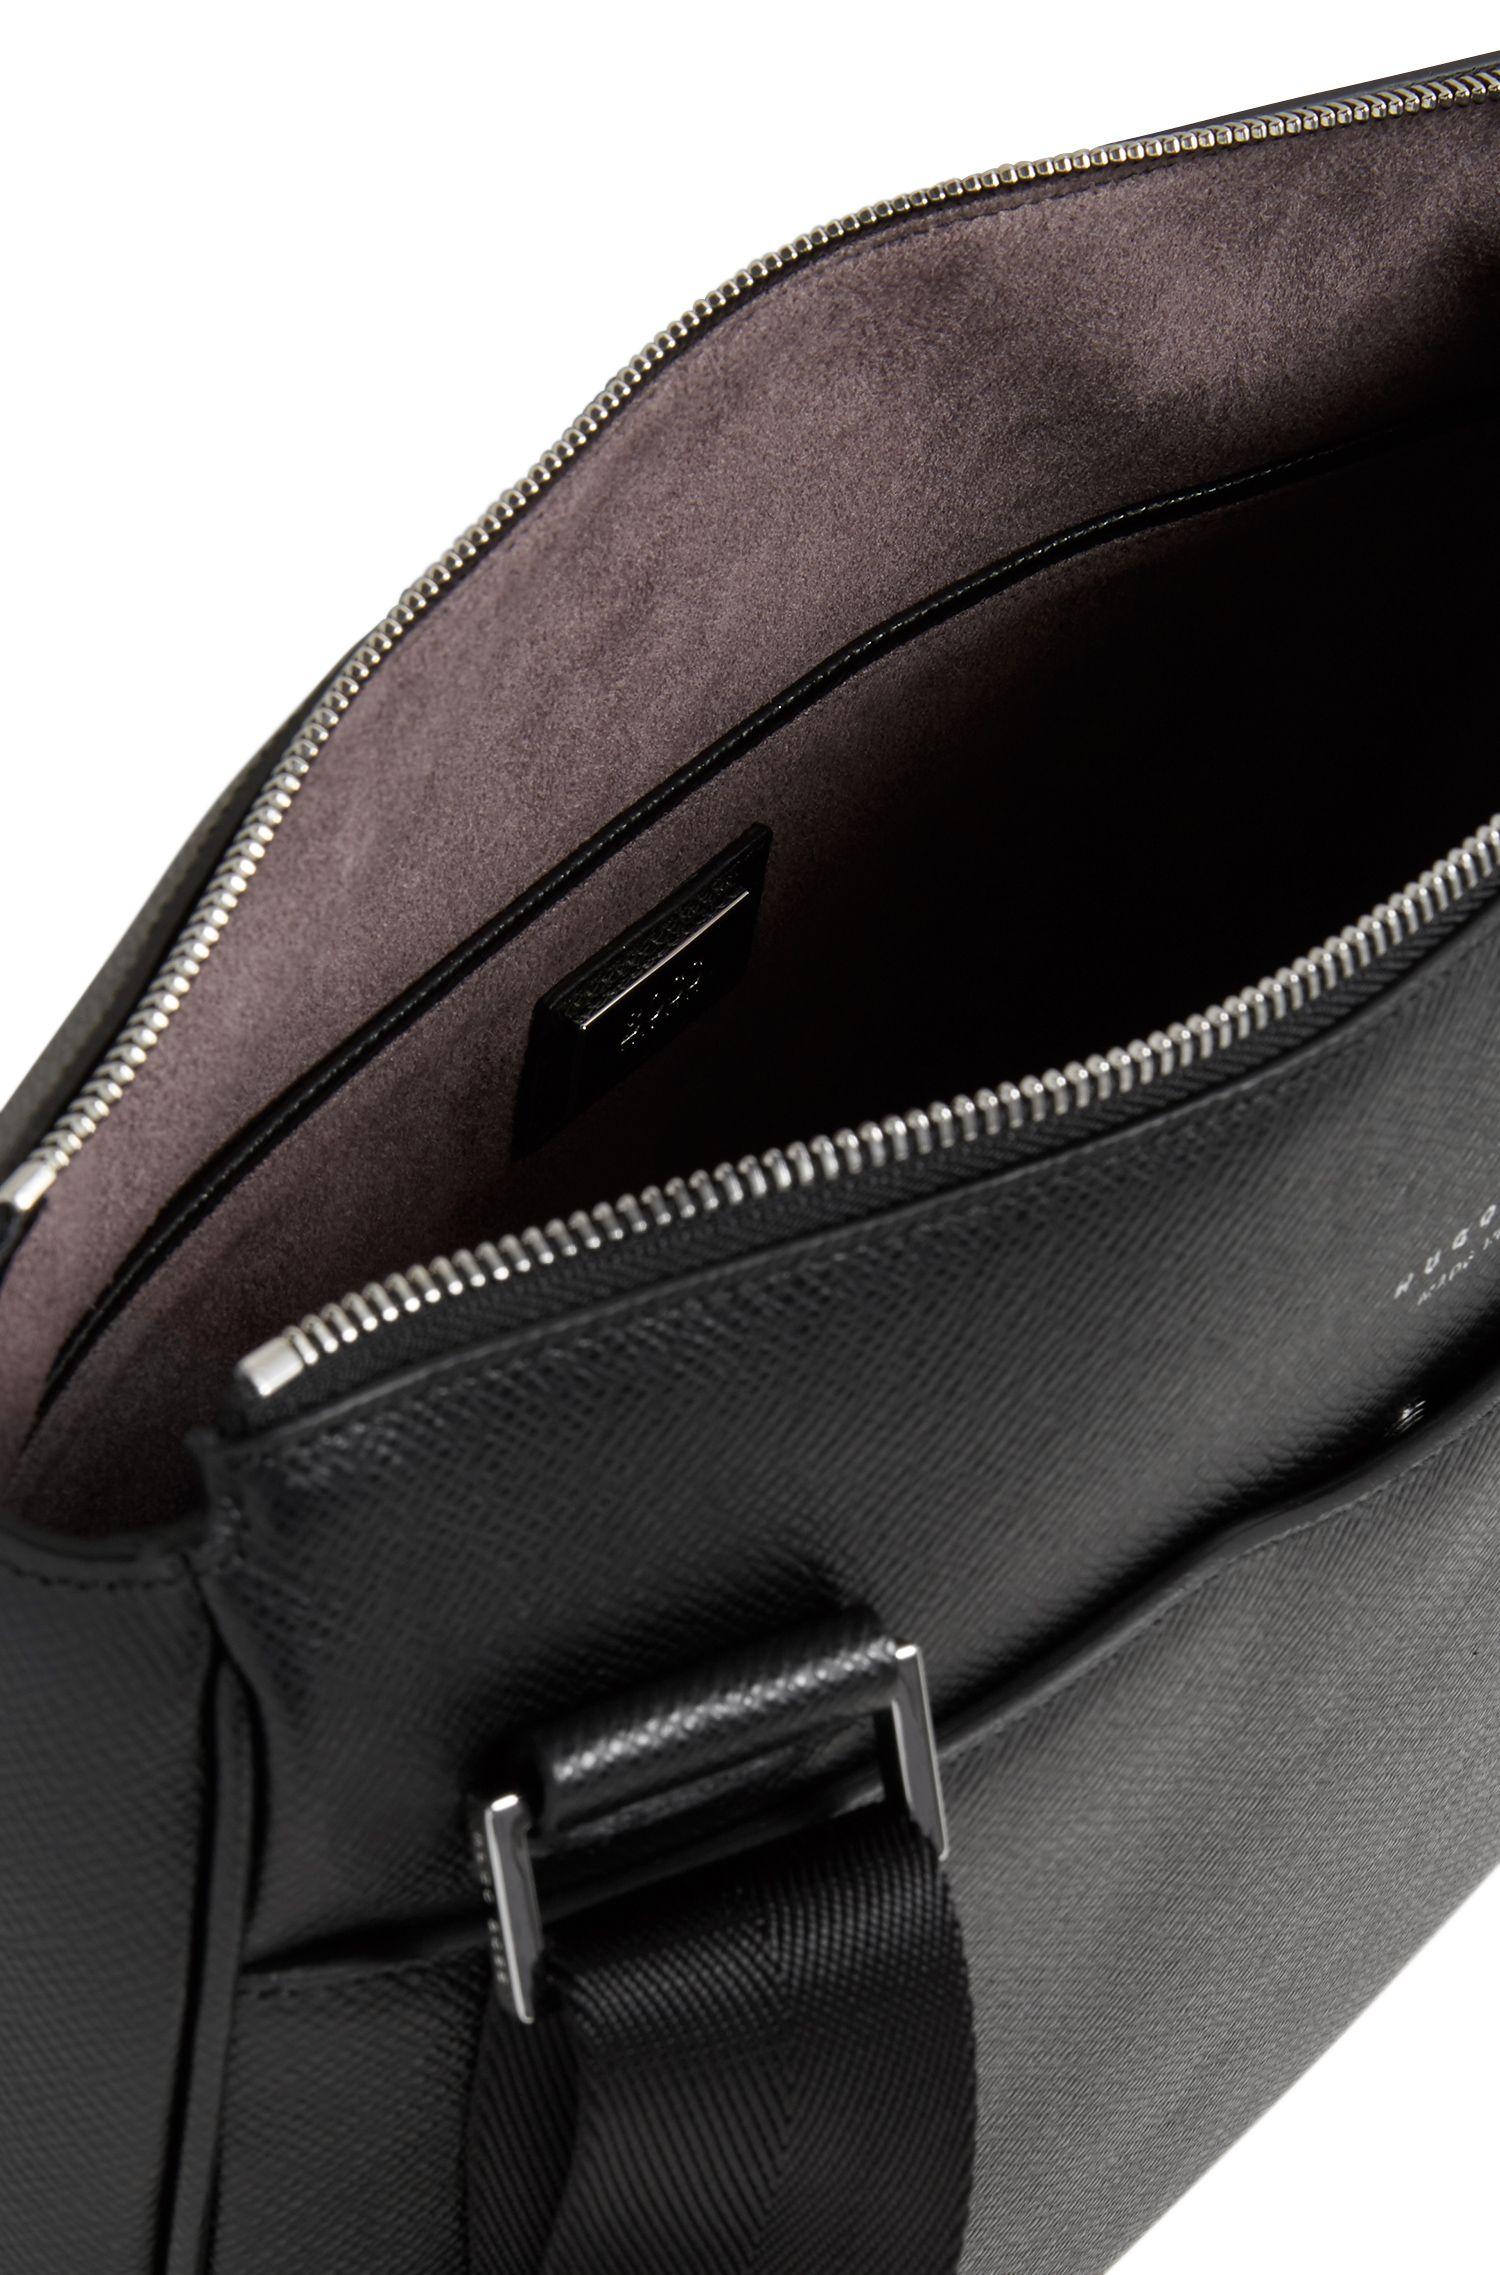 Leather Crossbody | Signature Cross Body